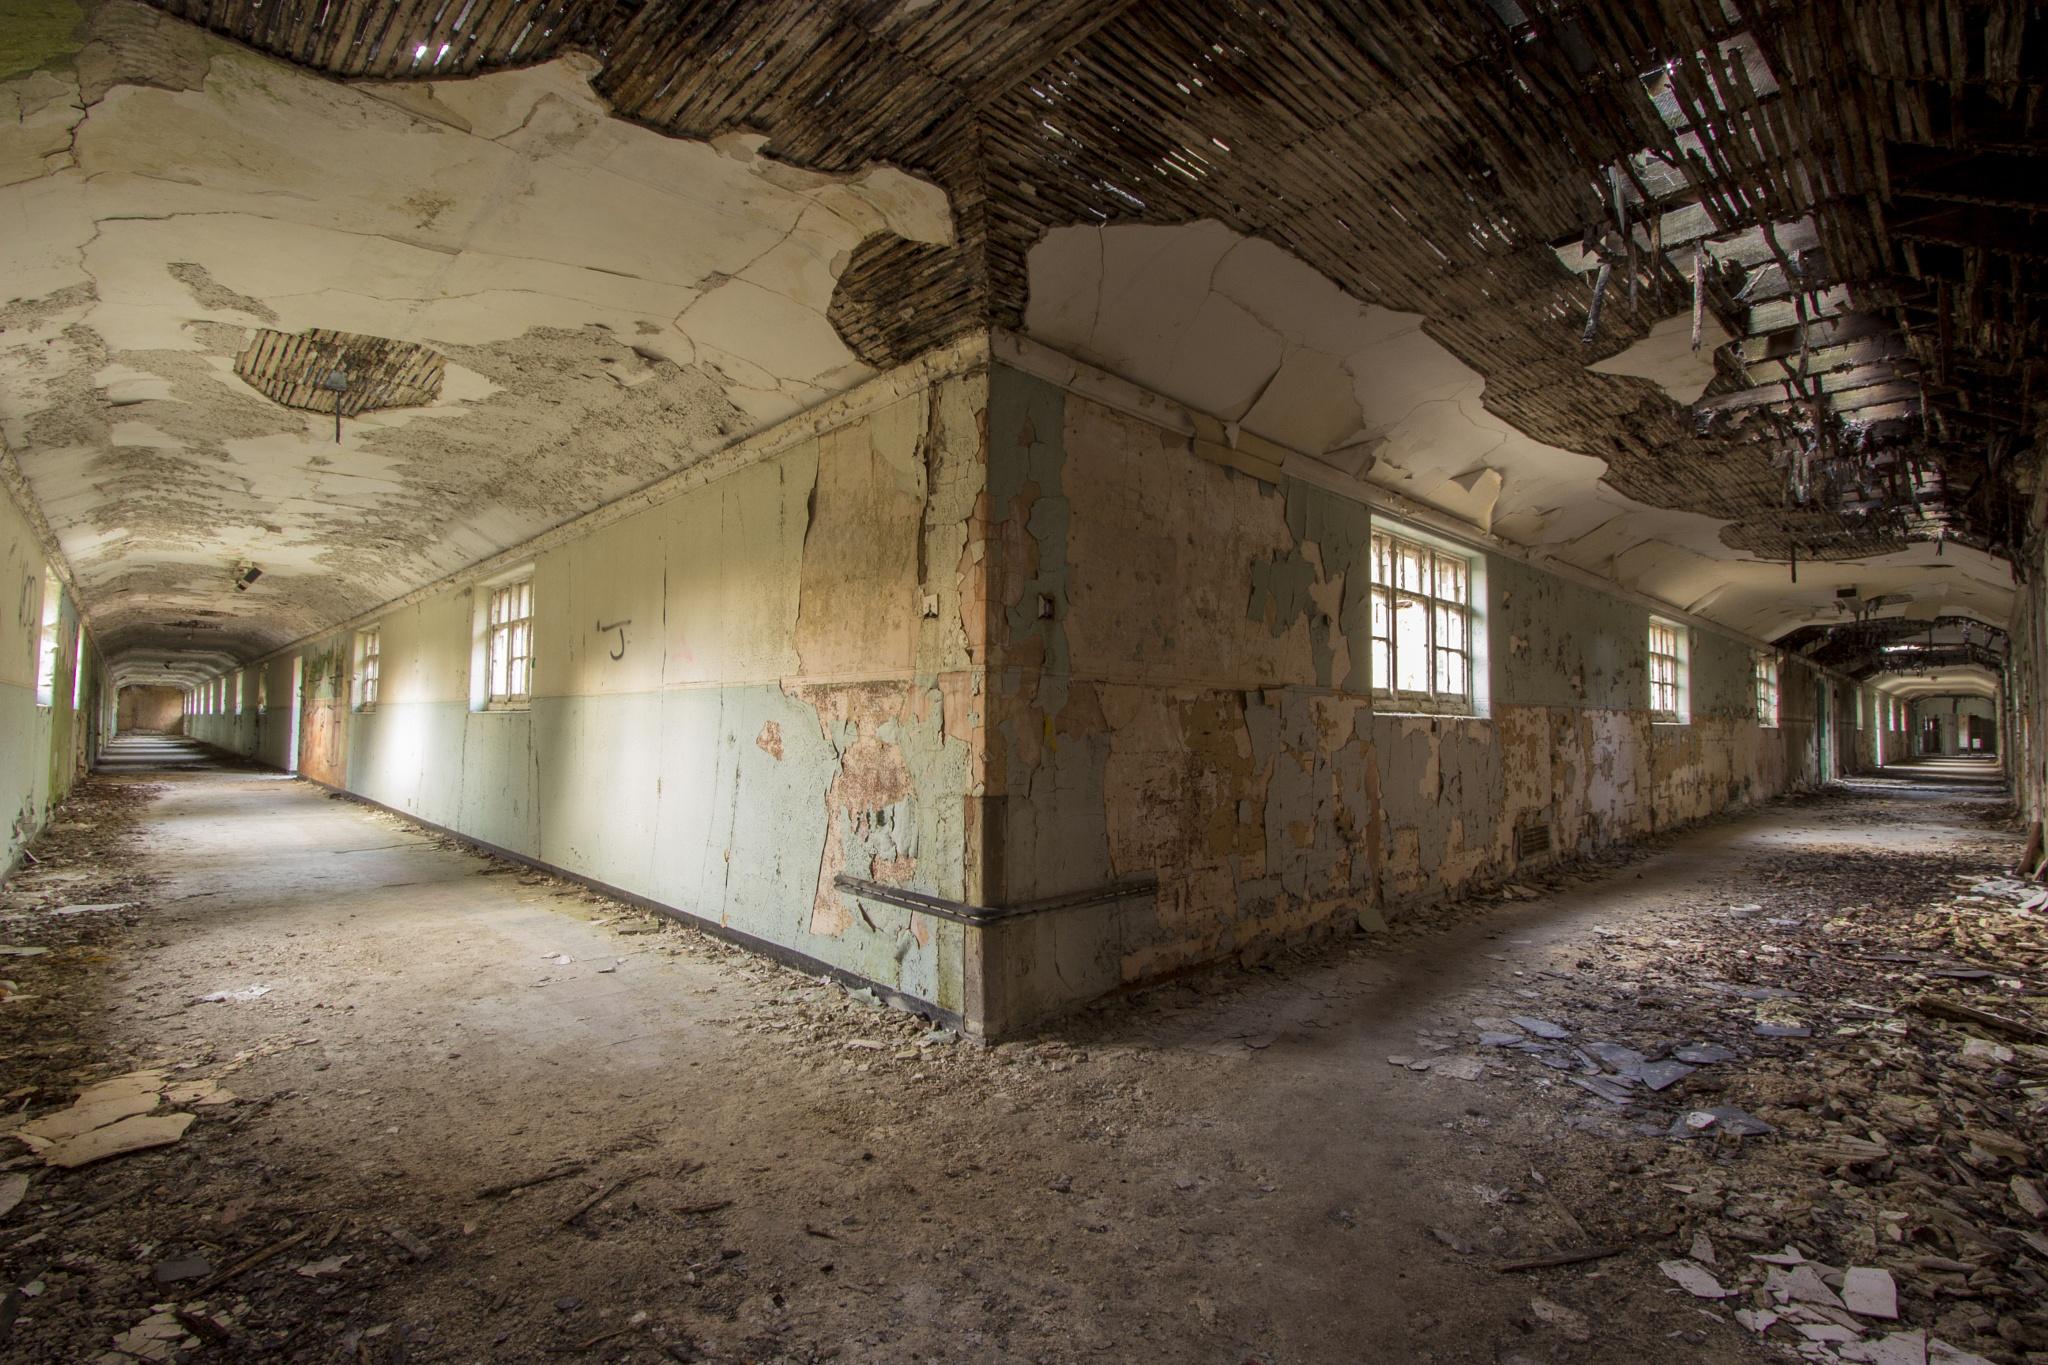 Decaying asylum  by Richie Gowen